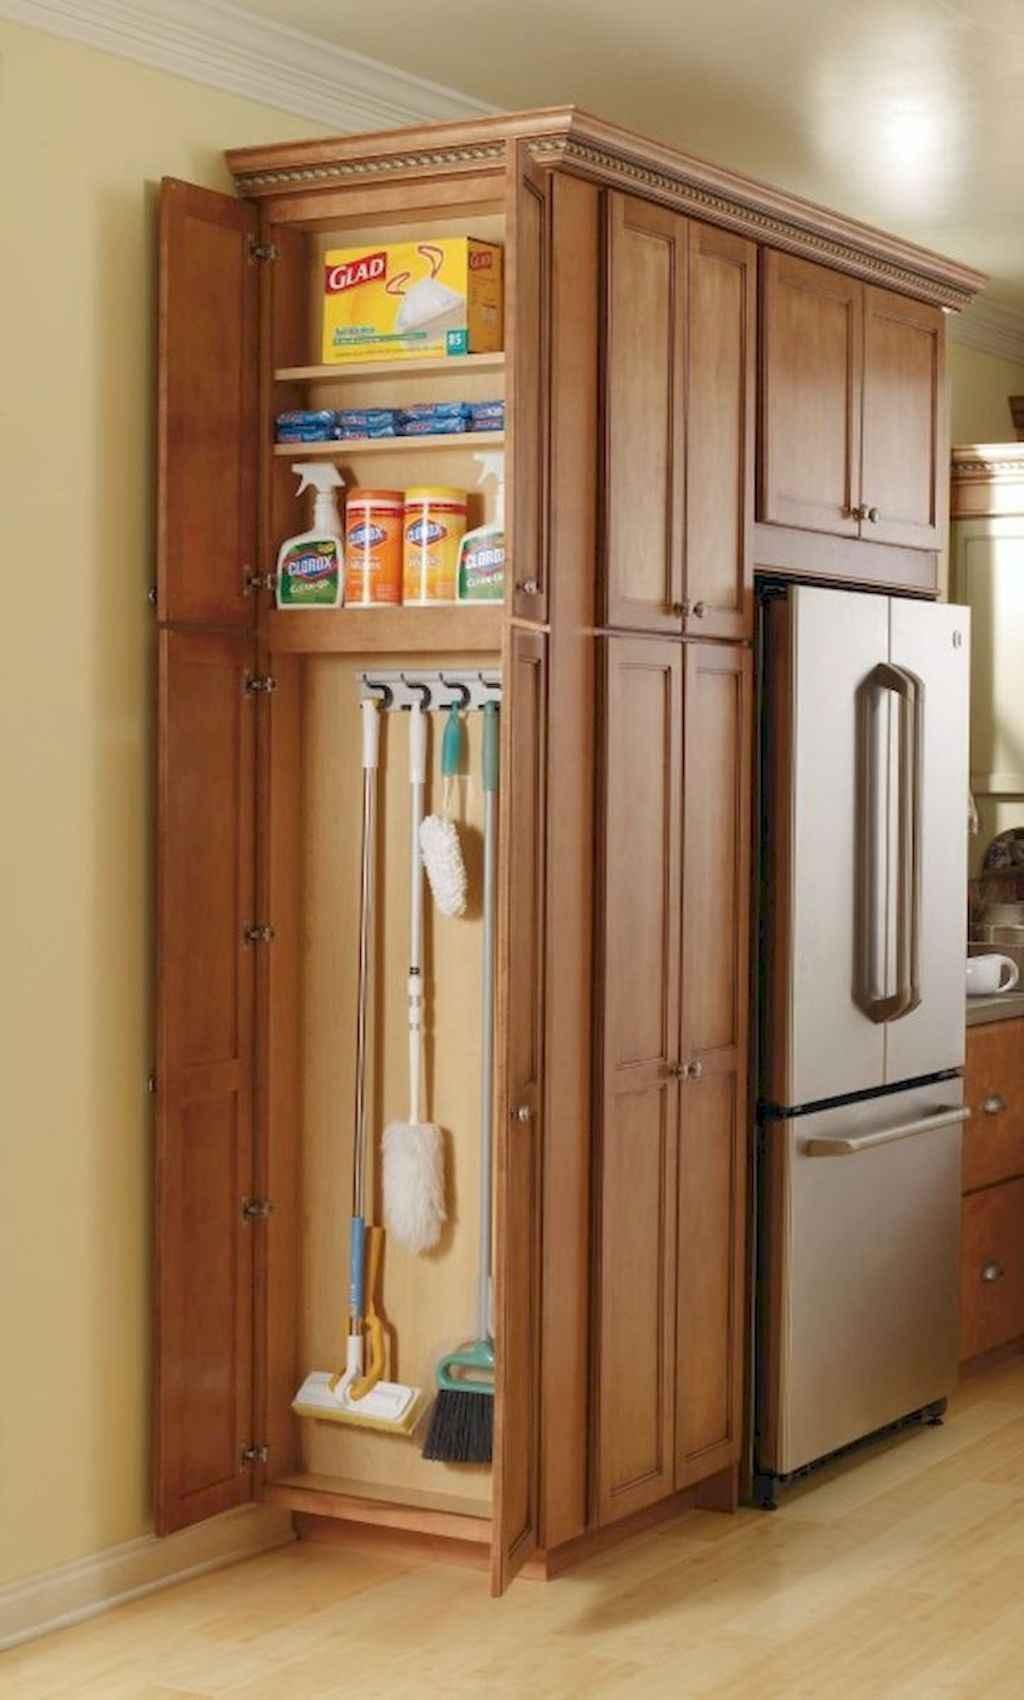 Top 29 Diy Ideas Adding Rustic Farmhouse Feels To Kitchen: 95 Best Farmhouse Kitchen Cabinet Makeover Design Ideas